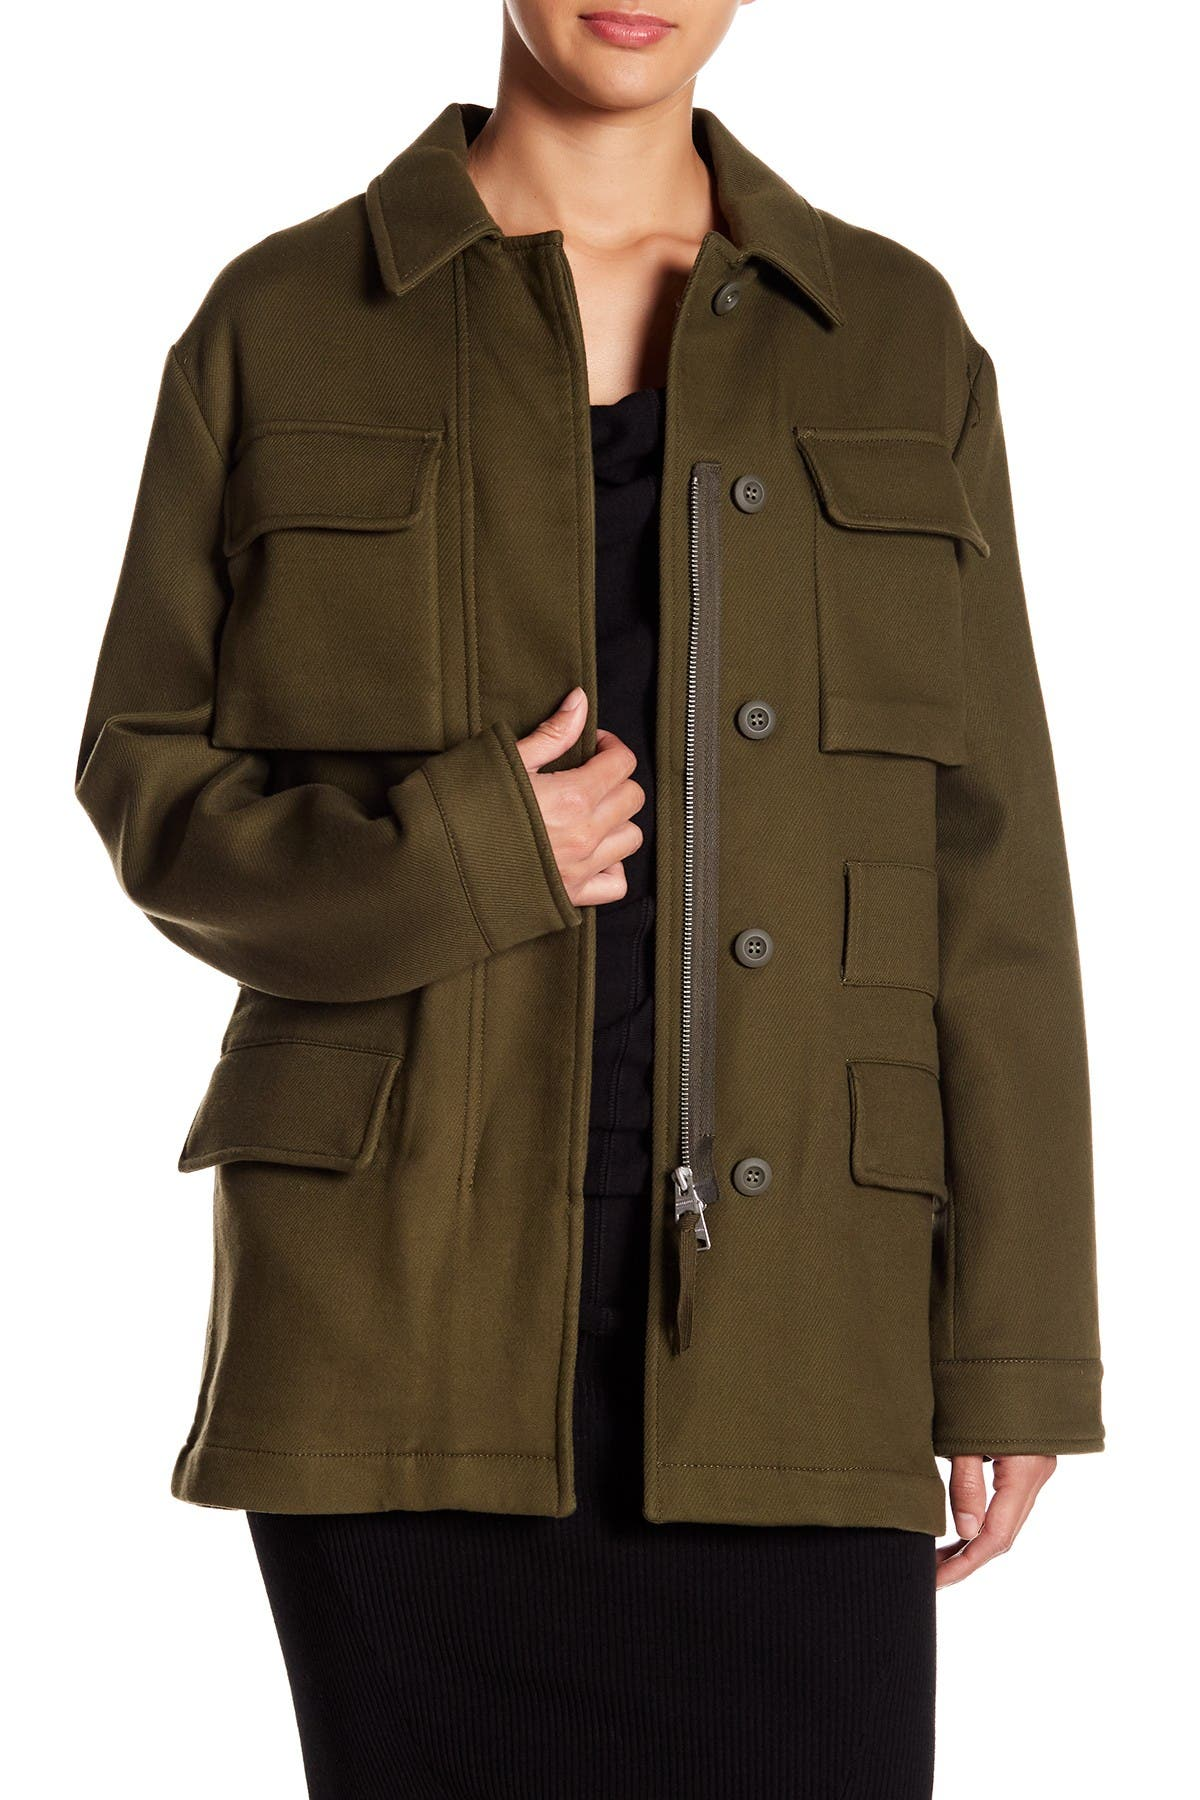 Image of ALLSAINTS Kaia Lamb Leather Jacket